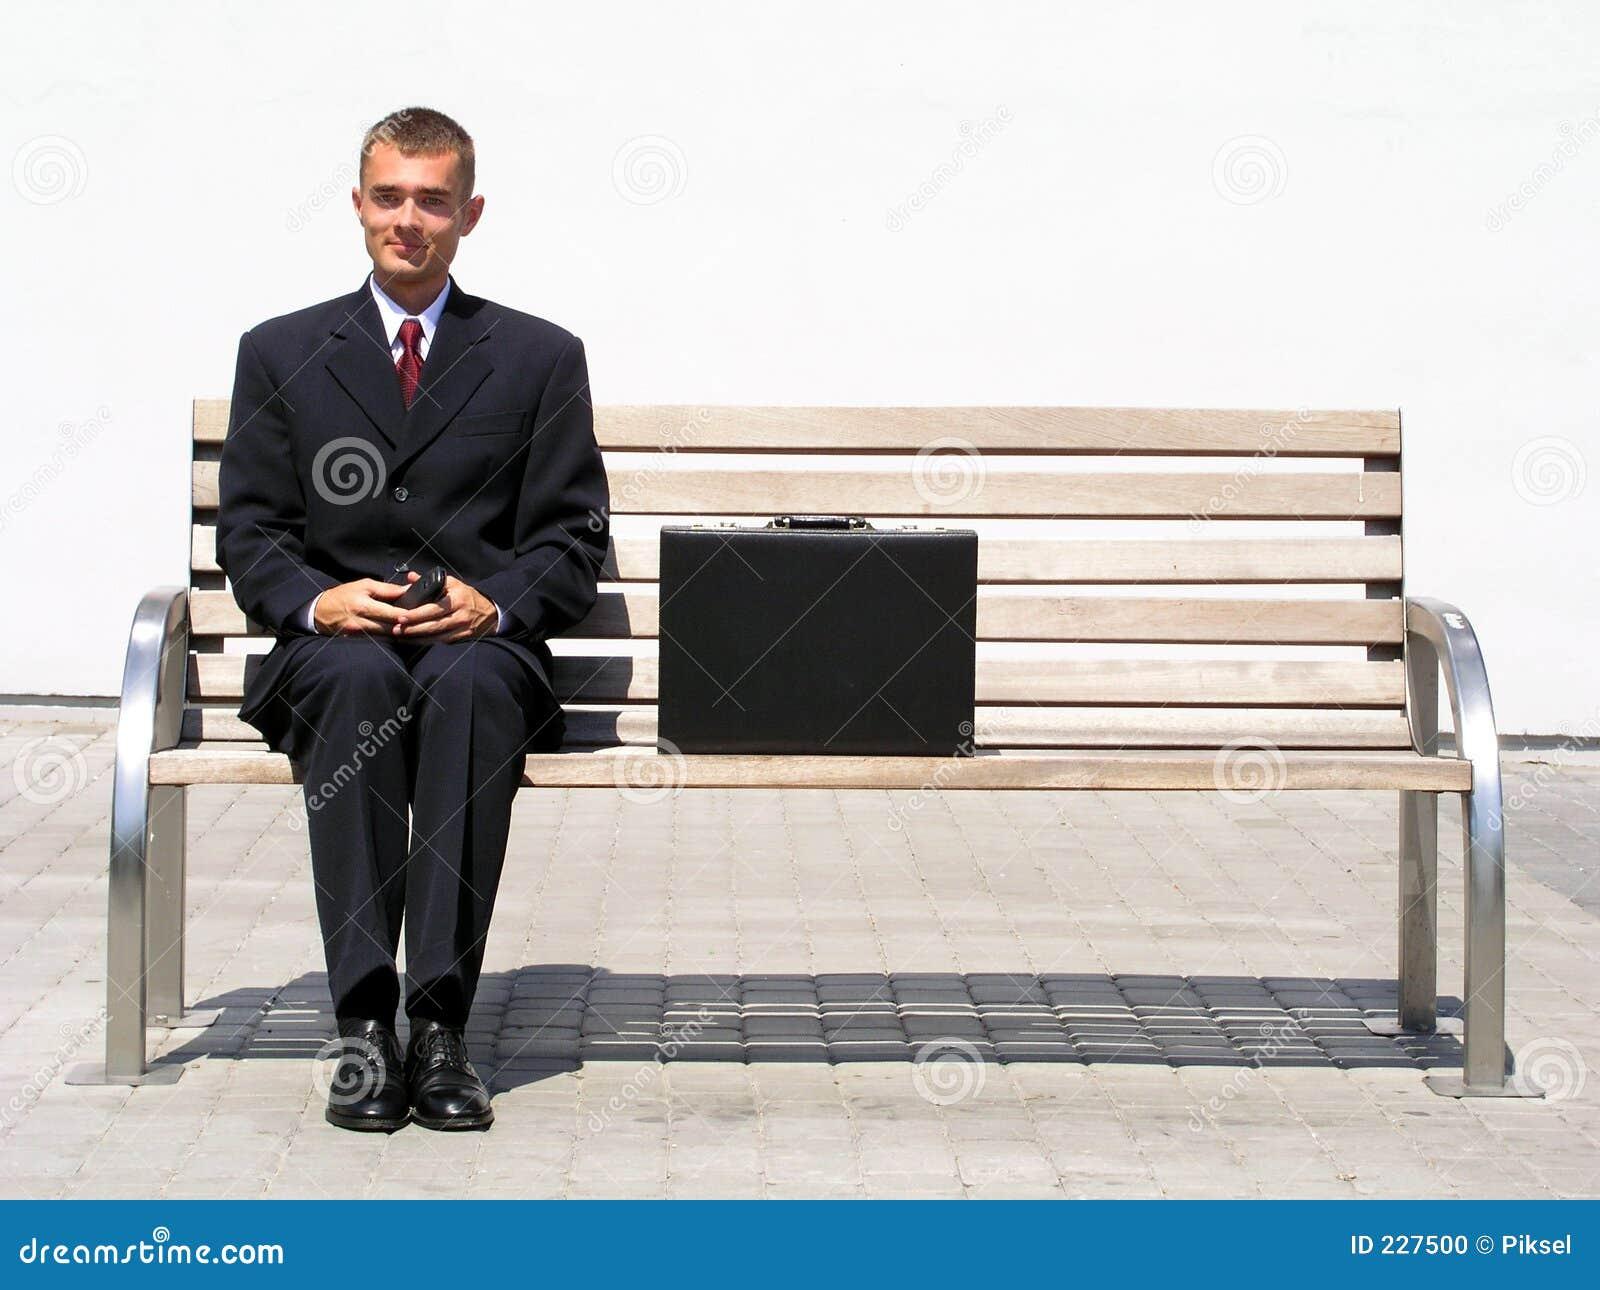 Businessman Sitting On Bench Stock Photo Image Of Waiting